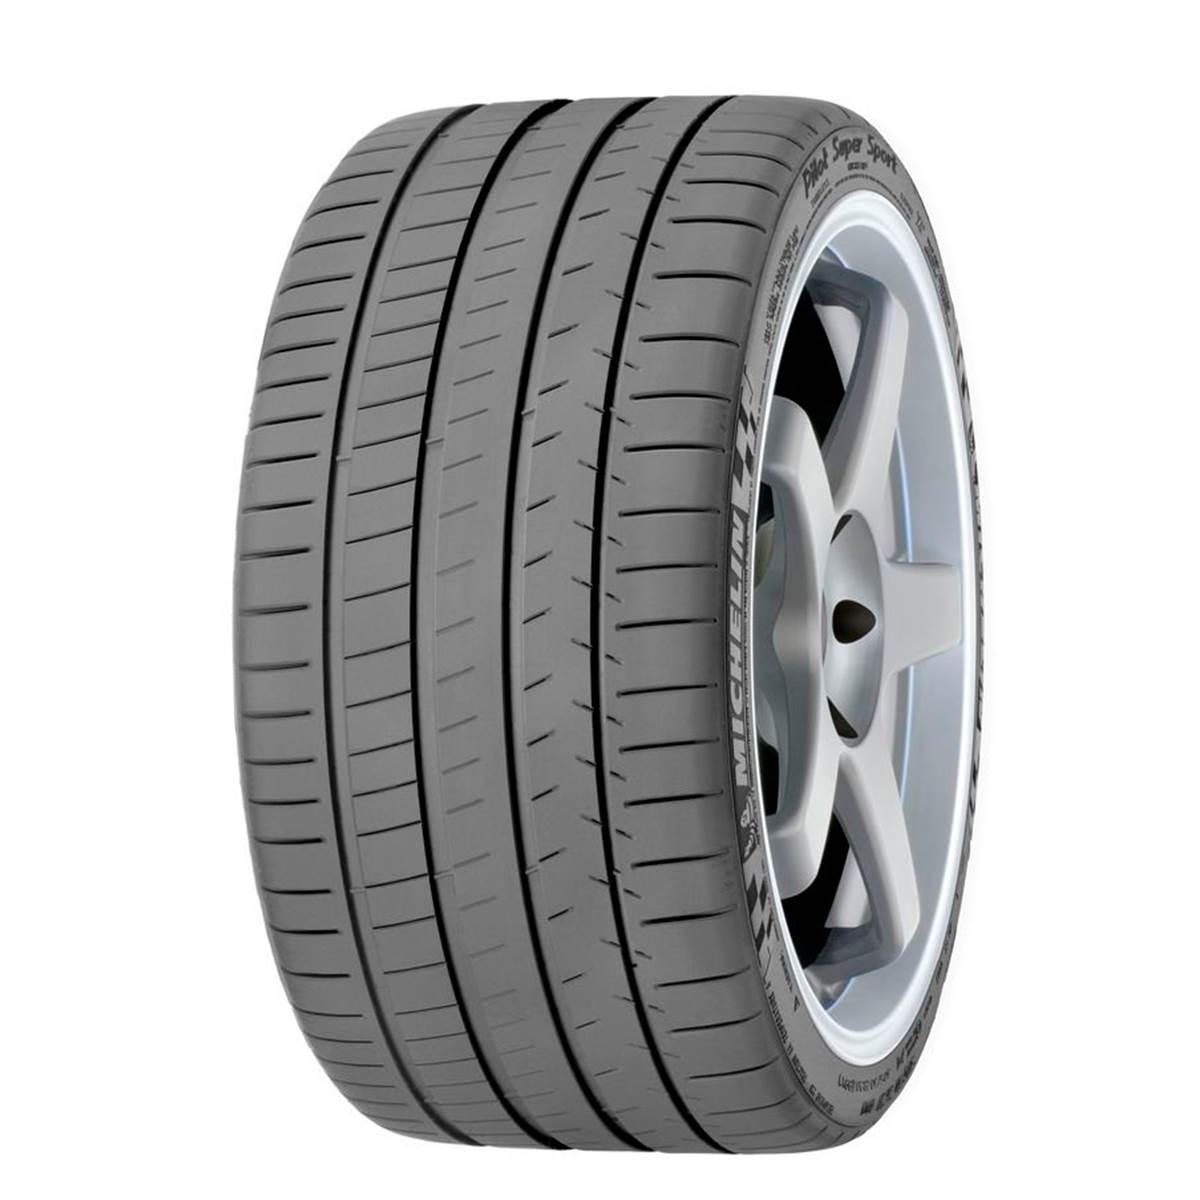 Pneu Michelin 295/30R21 102Y Pilot Super Sport XL